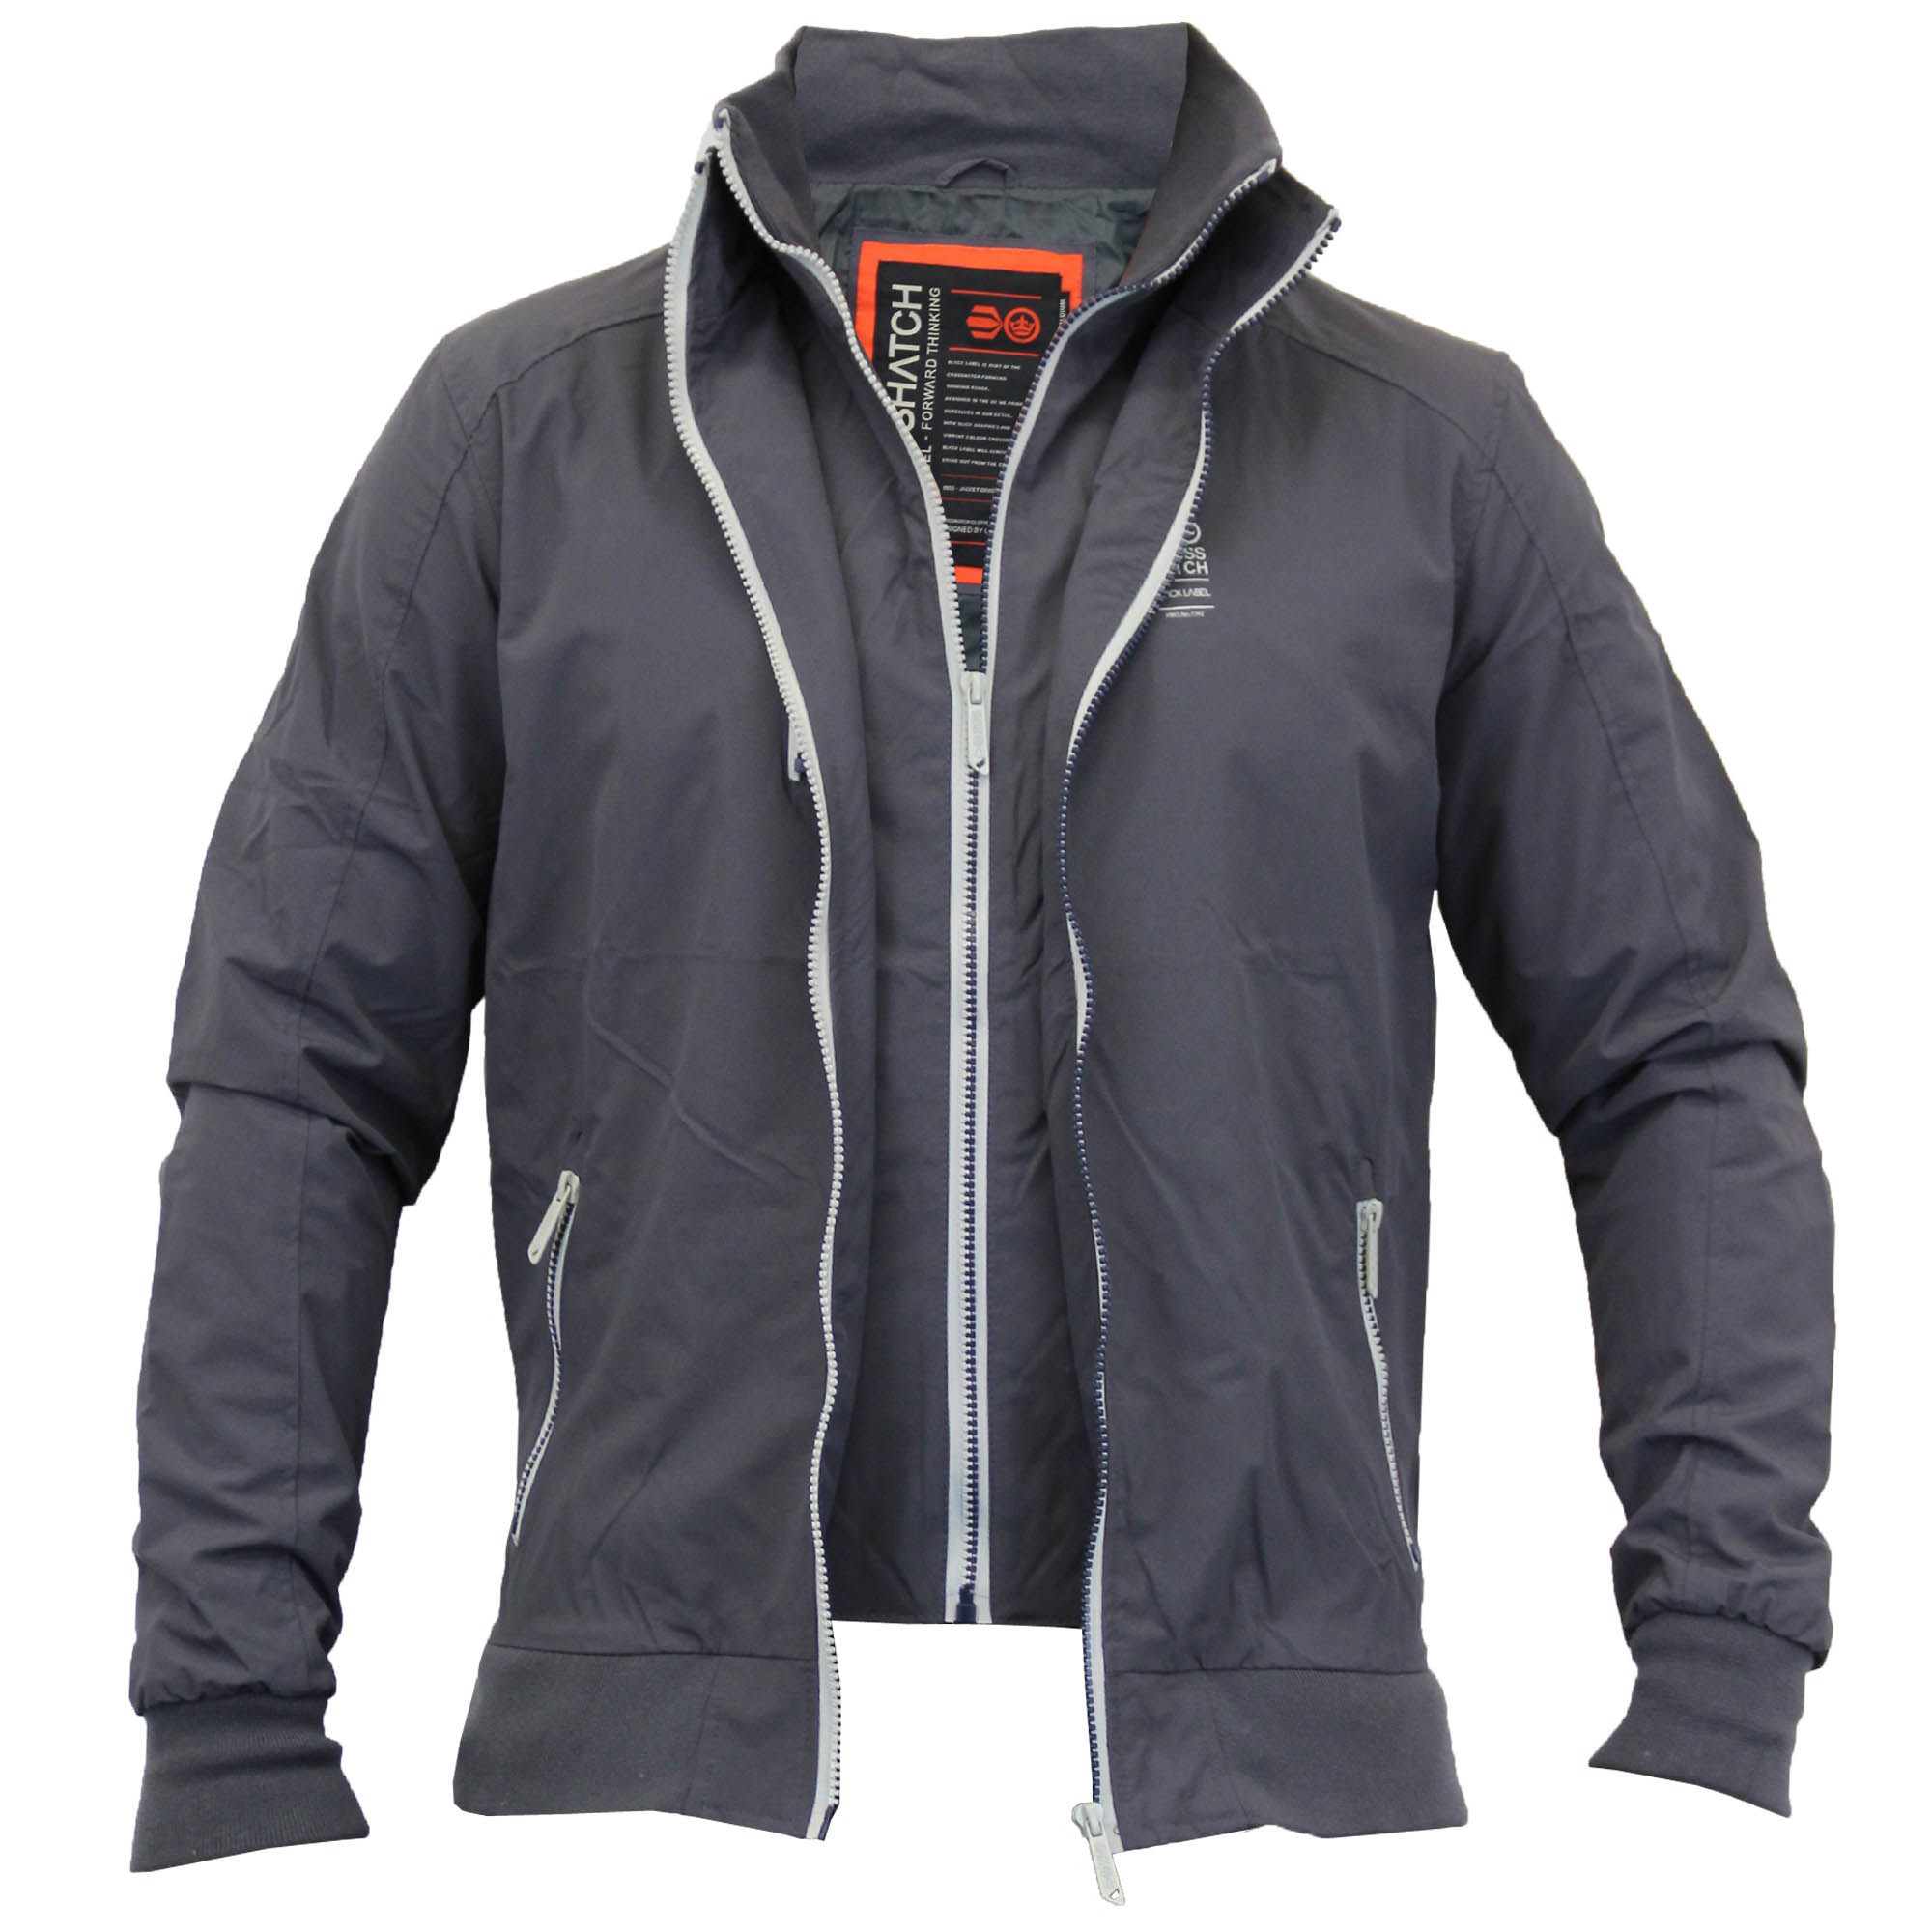 Mens Windbreaker Double Layer Jacket/Coat By Crosshatch